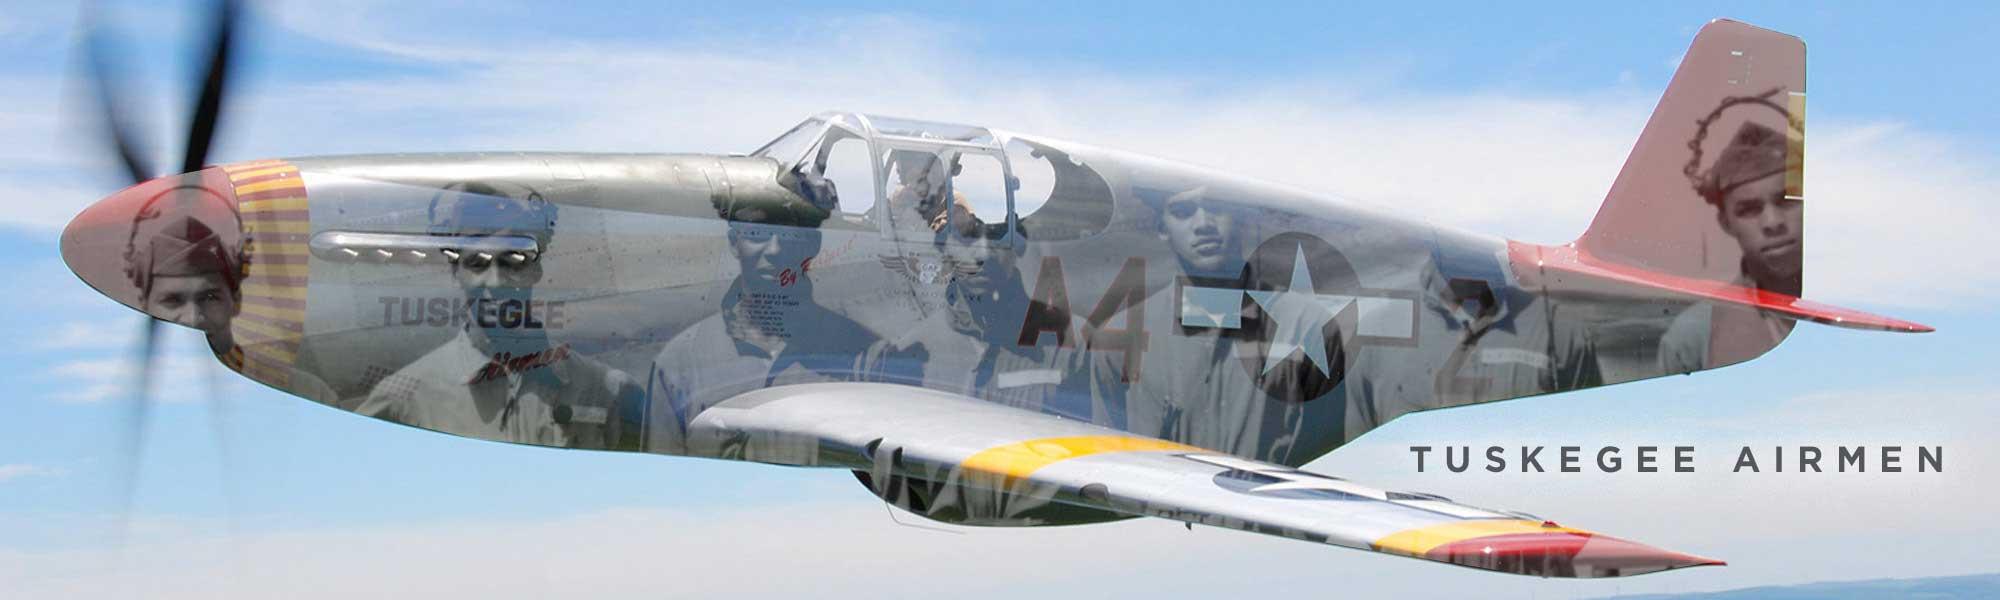 macon-county-tuskegee-airmen